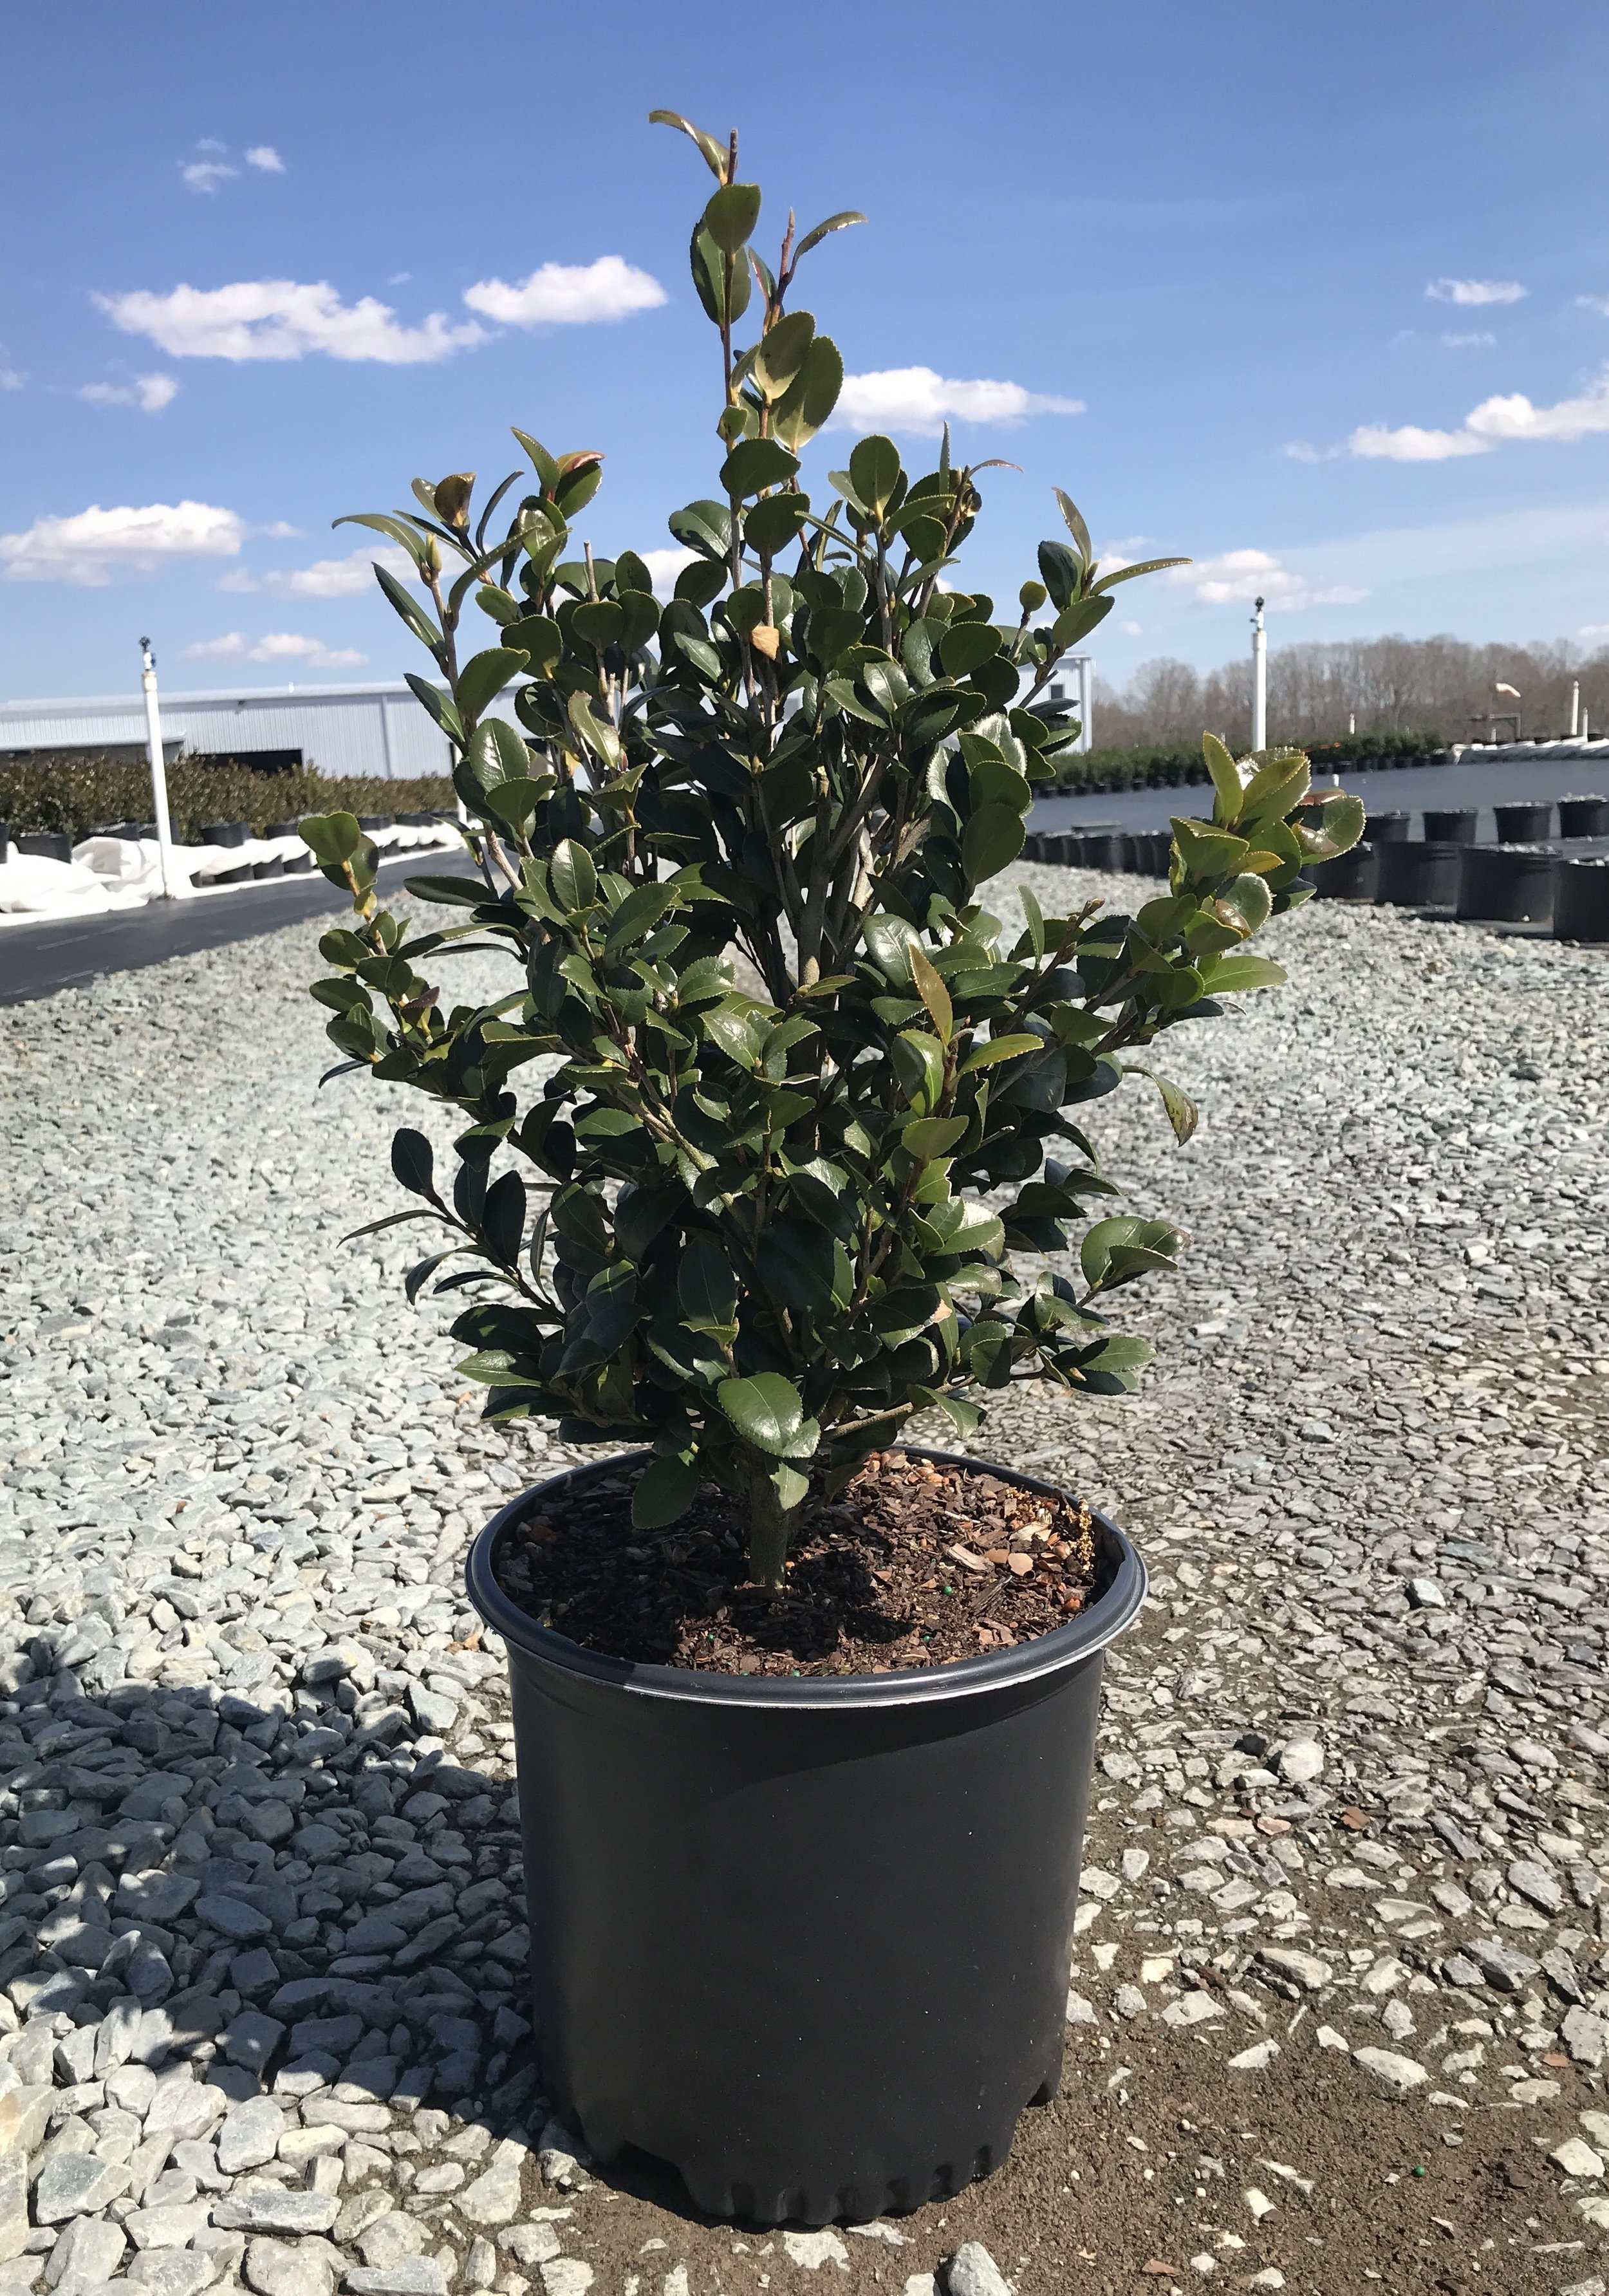 Camellia sasanqua 'Yuletide' 3 gallon